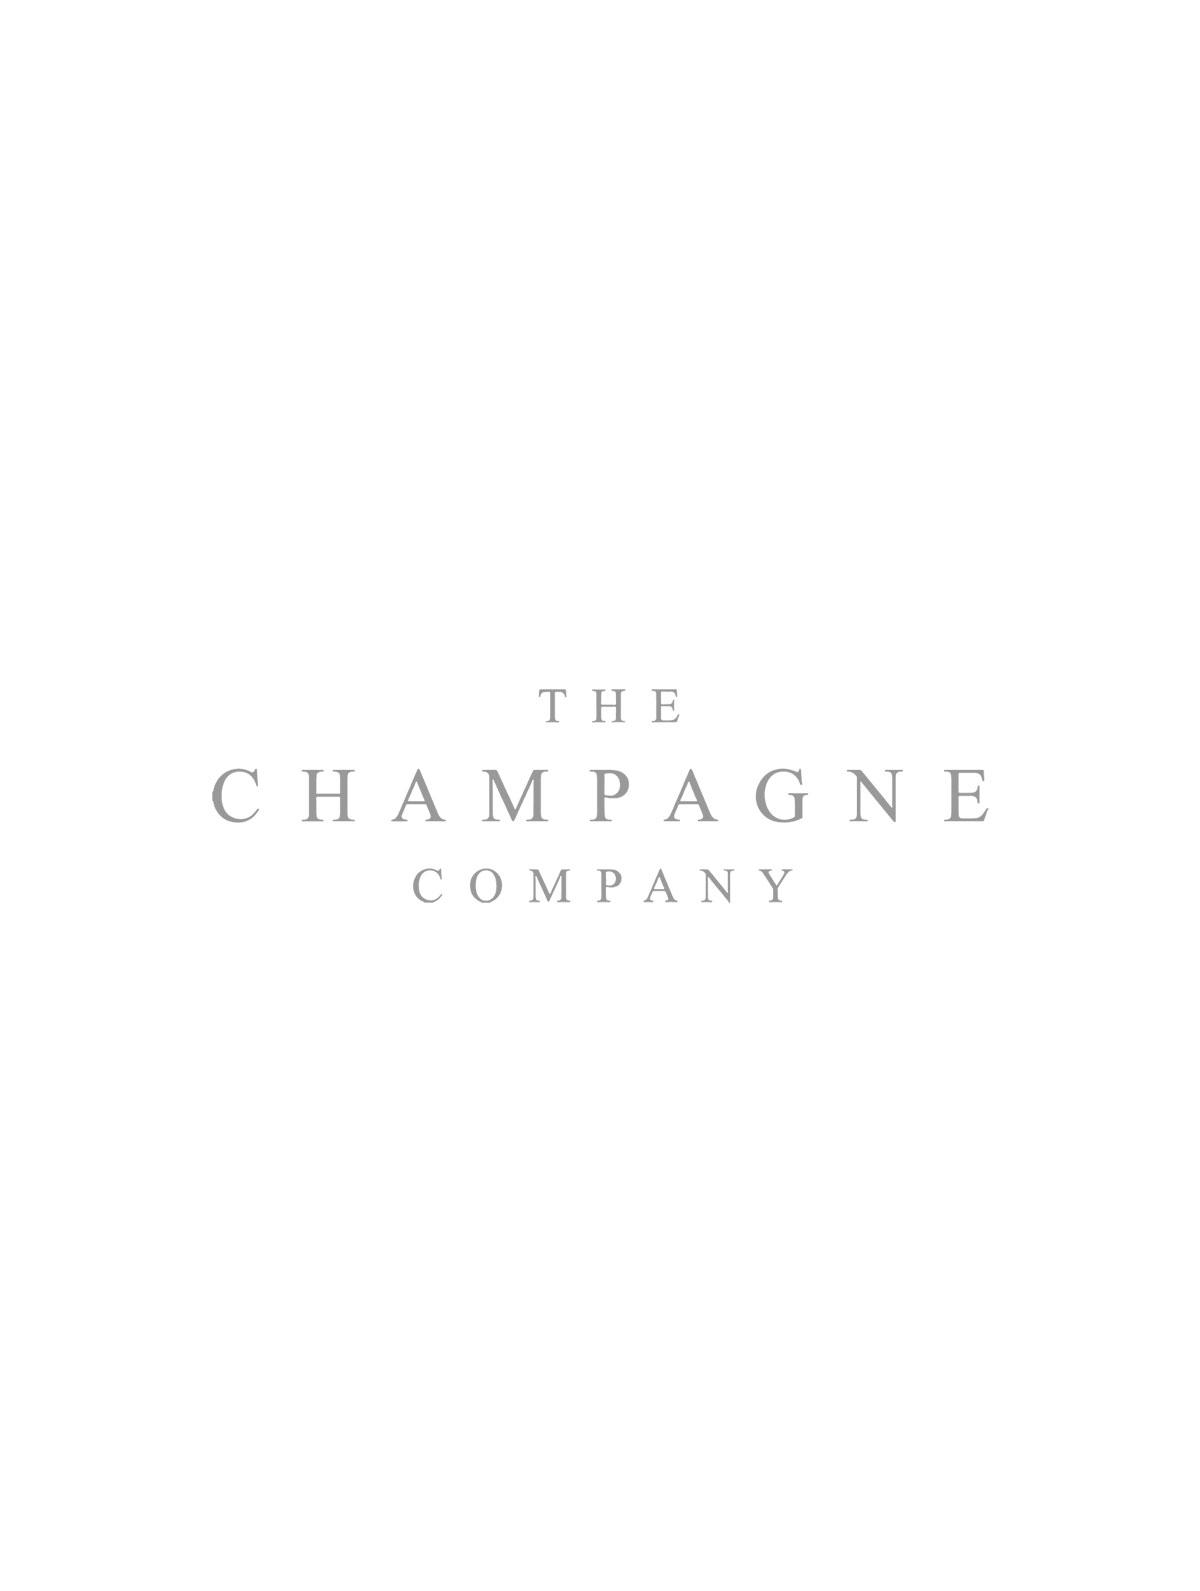 Moet Chandon Champagne Lsa Moya